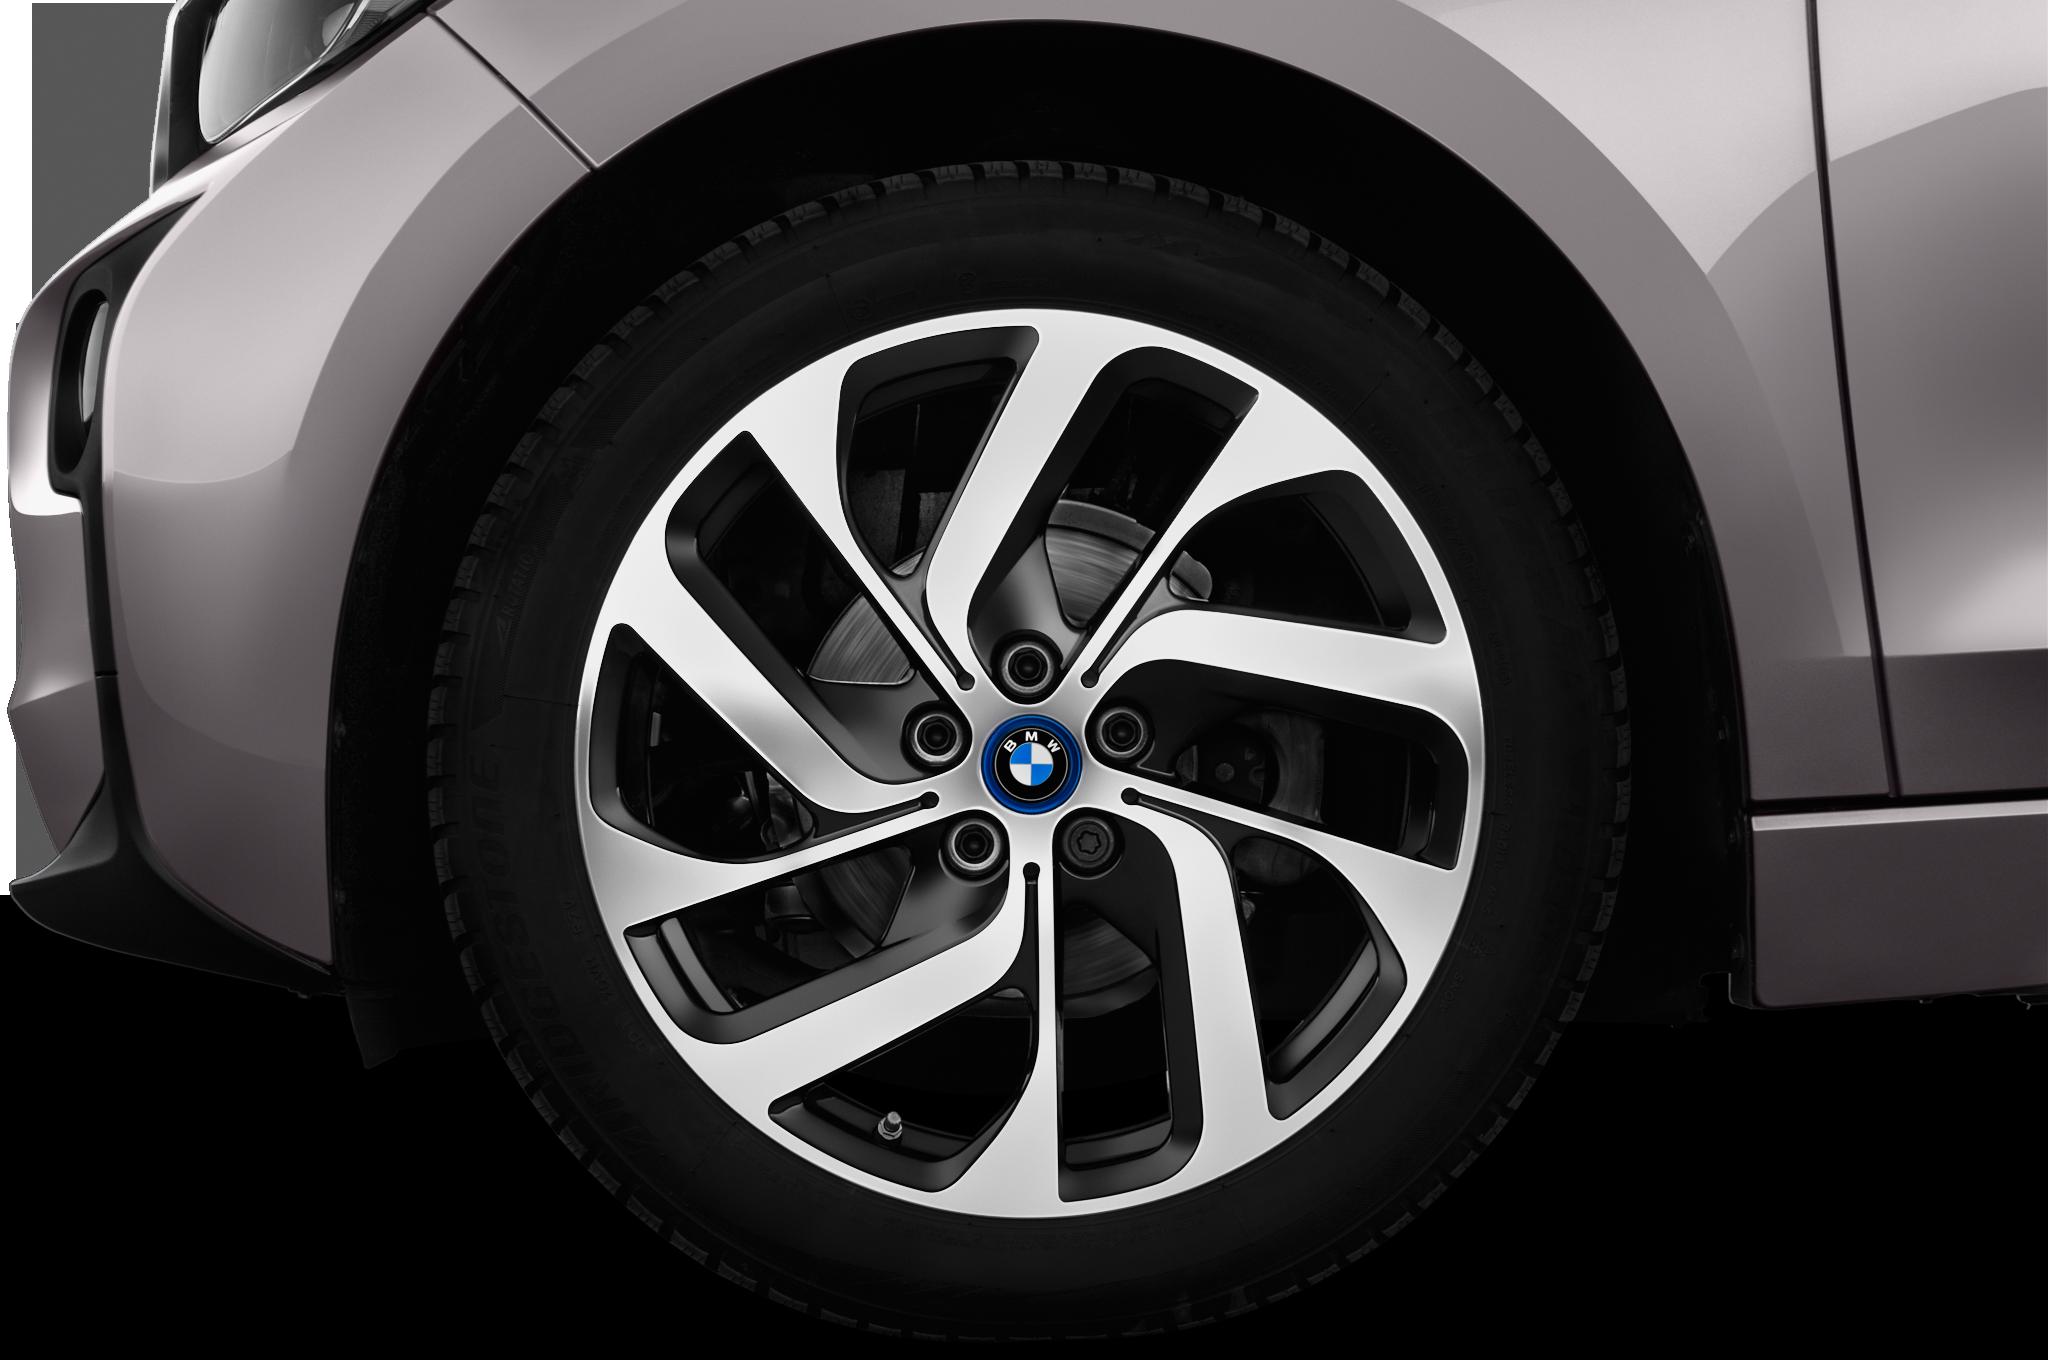 Report: BMW X7 Three-Row SUV In Development – Automobile